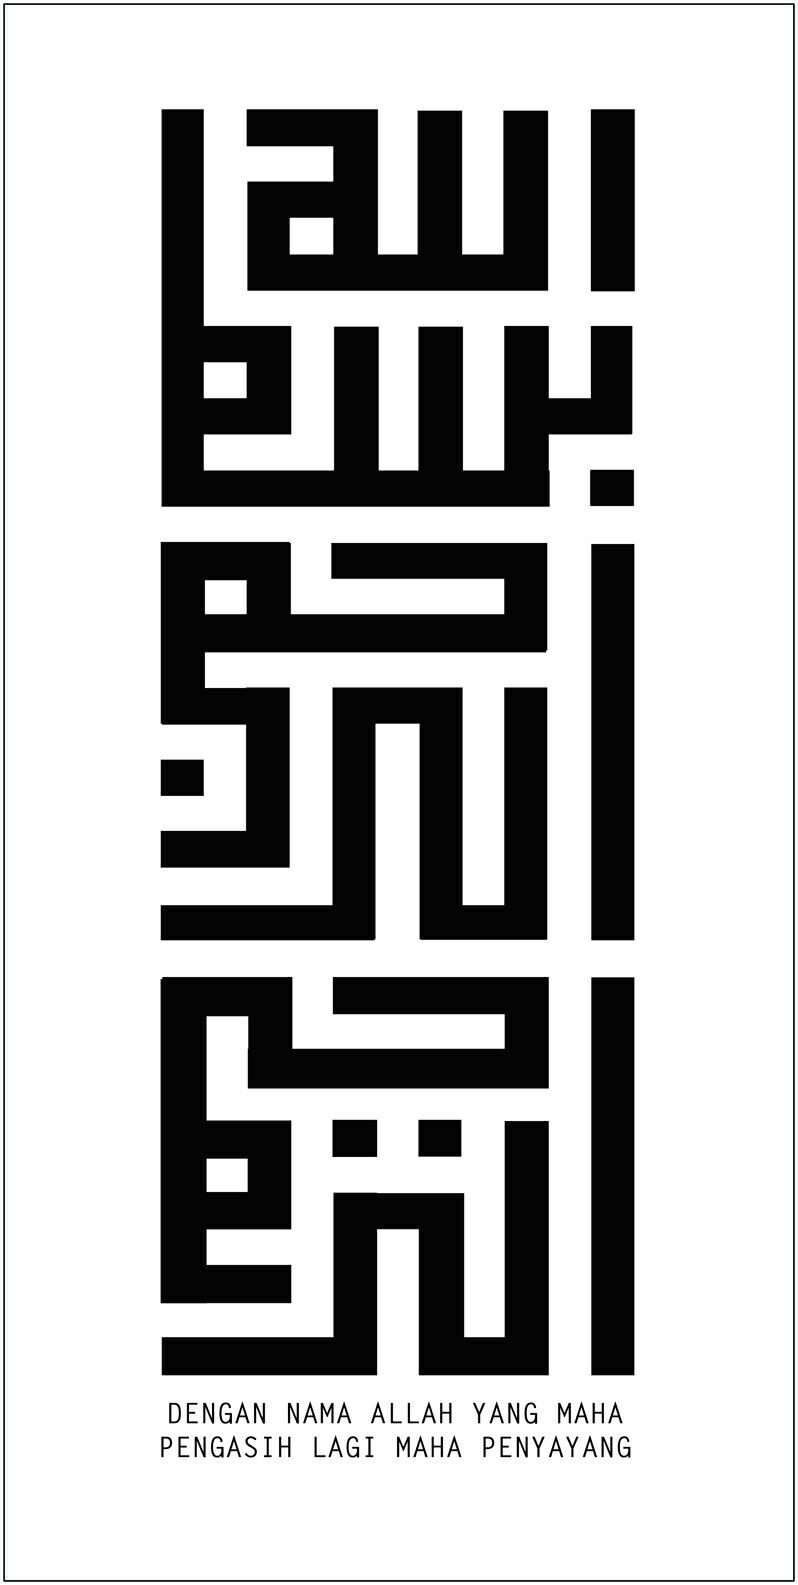 Pin Oleh Kia Ahmad Di Kufi Art Seni Kaligrafi Kata Kata Indah Seni